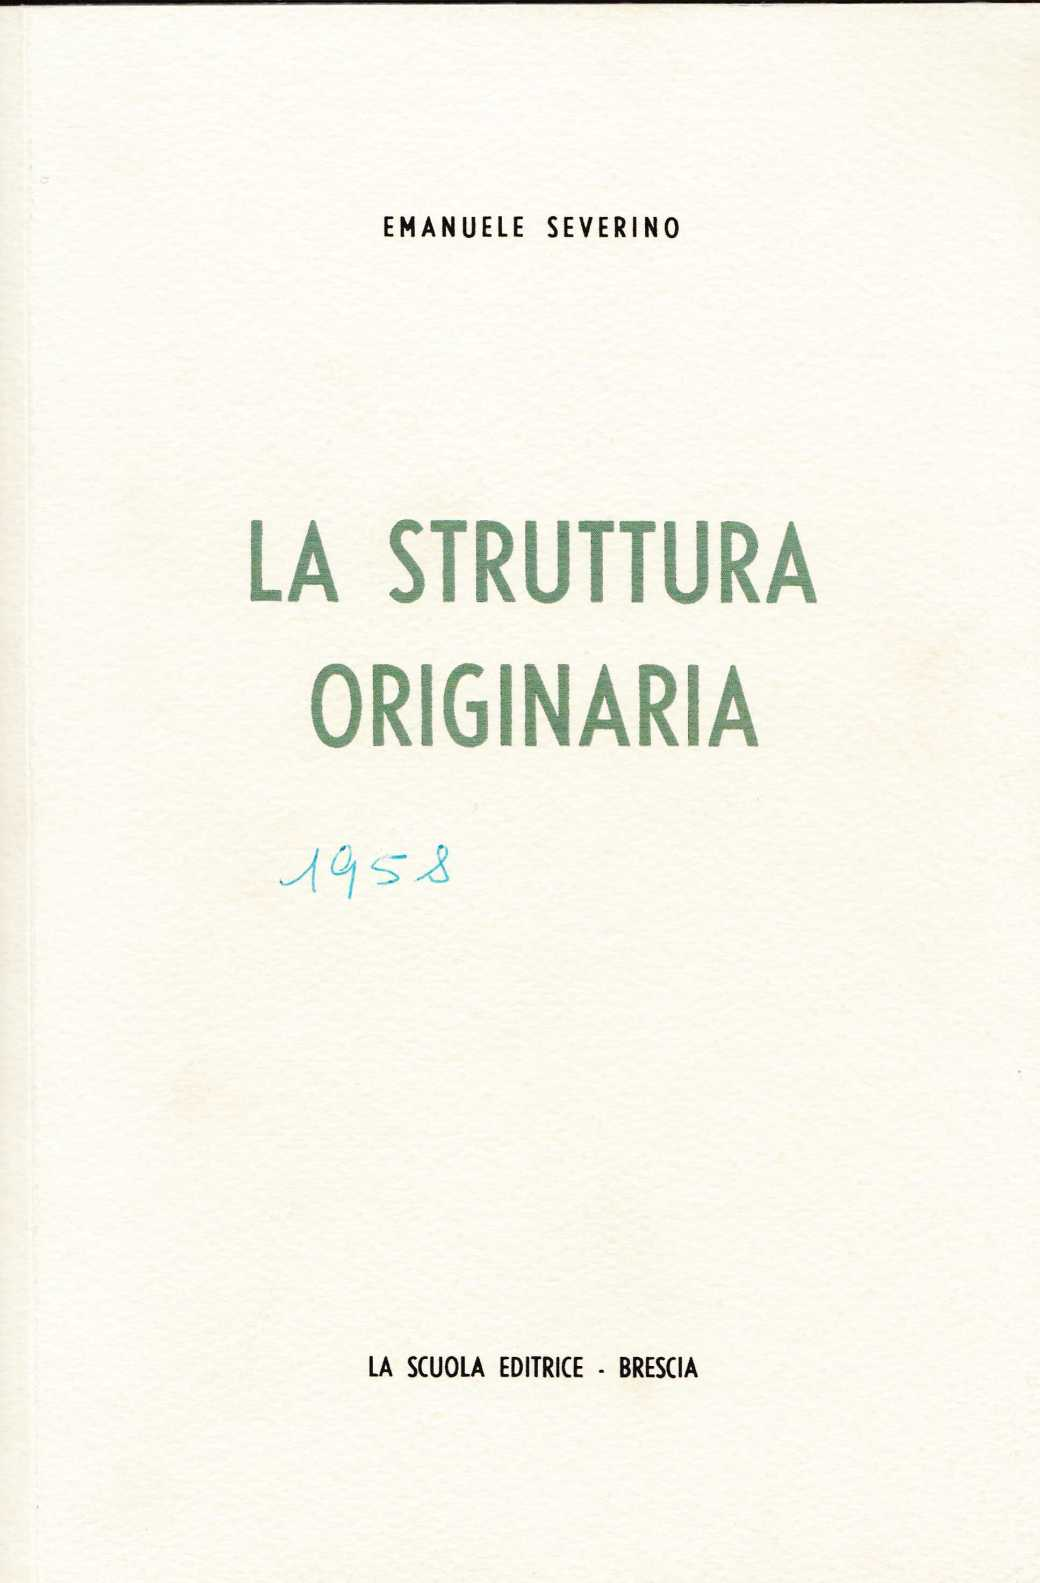 strutturaoriginaria4321